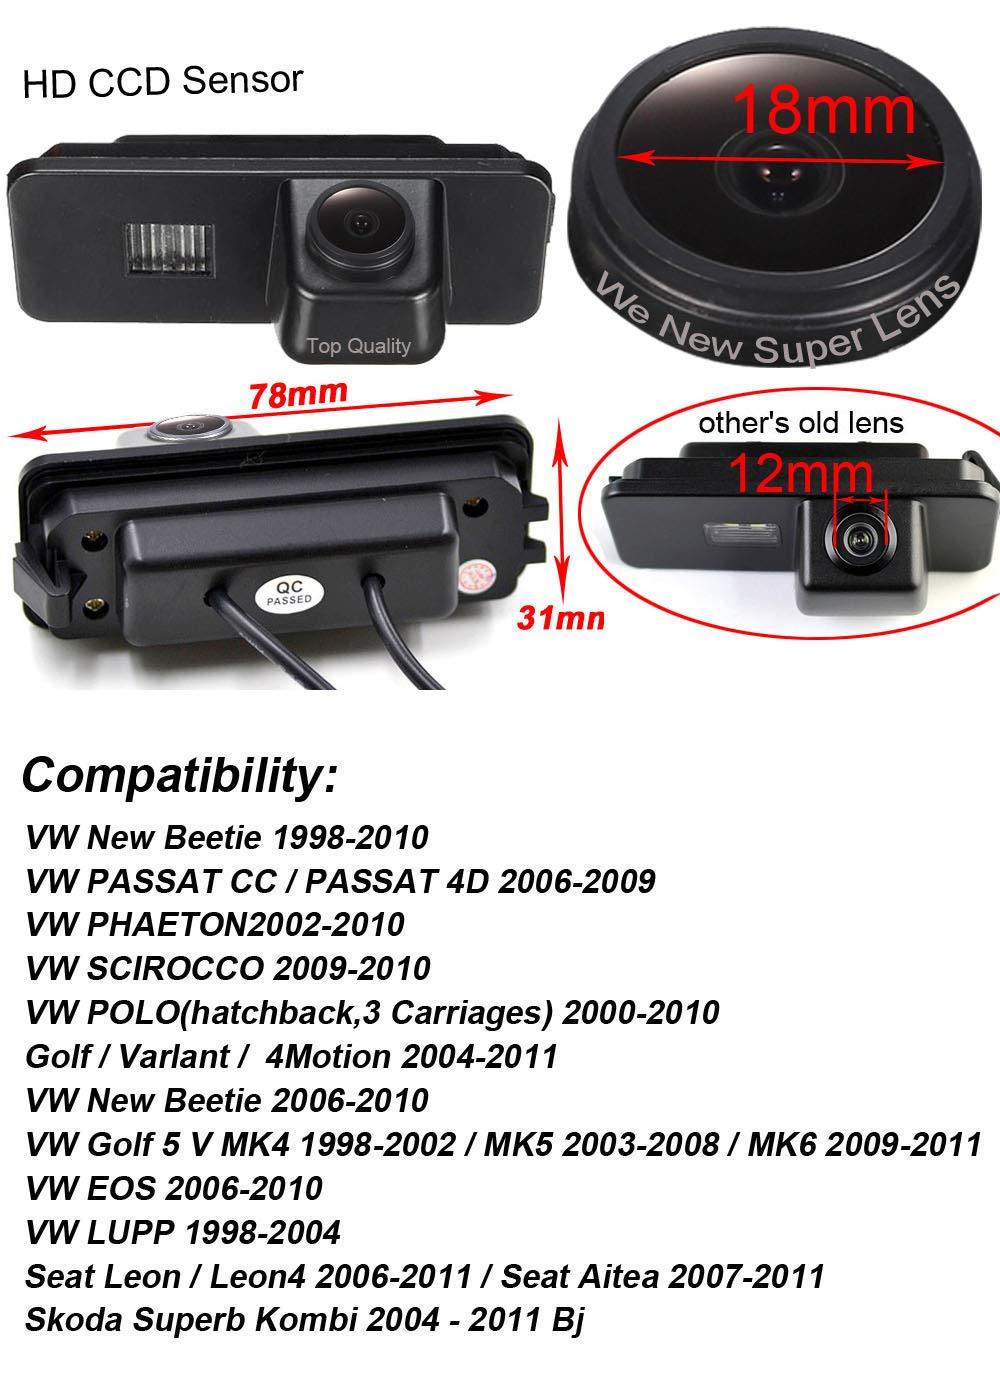 Auto-1000TV-Linien-Sternenlicht-Super-Pro-HD-Objektiv-Rckfahrkamera-verbesserte-Einparkhilfe-Nachtsicht-170-Wasserdicht-fr-VW-New-Beetle-Passat-CC-4D-Phaeton-Polo-Golf-5-V-MK456-Variant